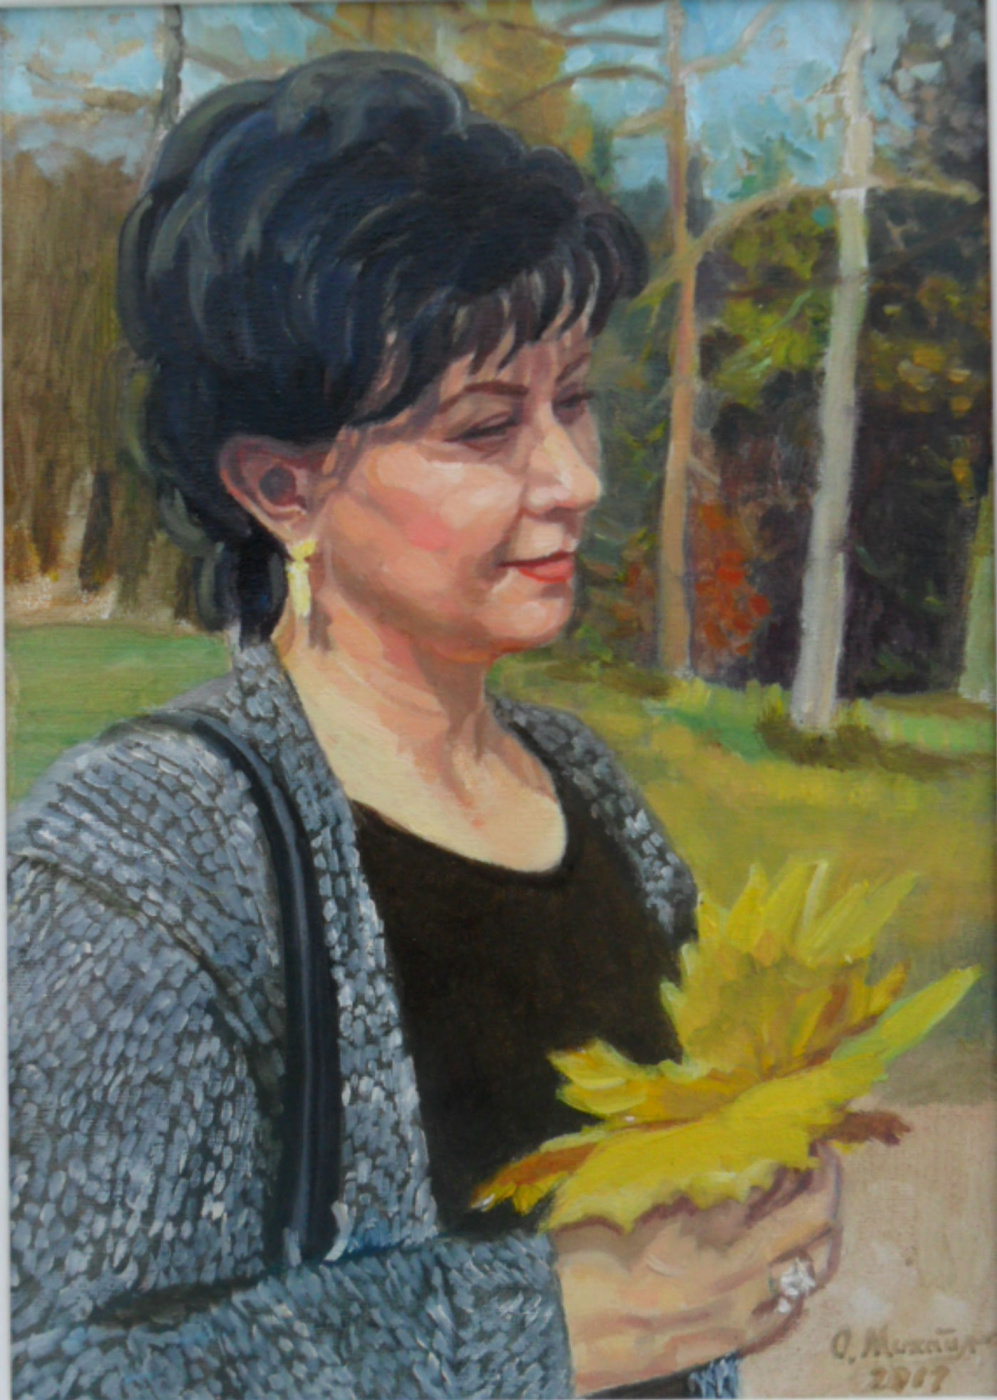 Olga Vladimirovna Mikhaylenko. Woman portrait with autumn leaves